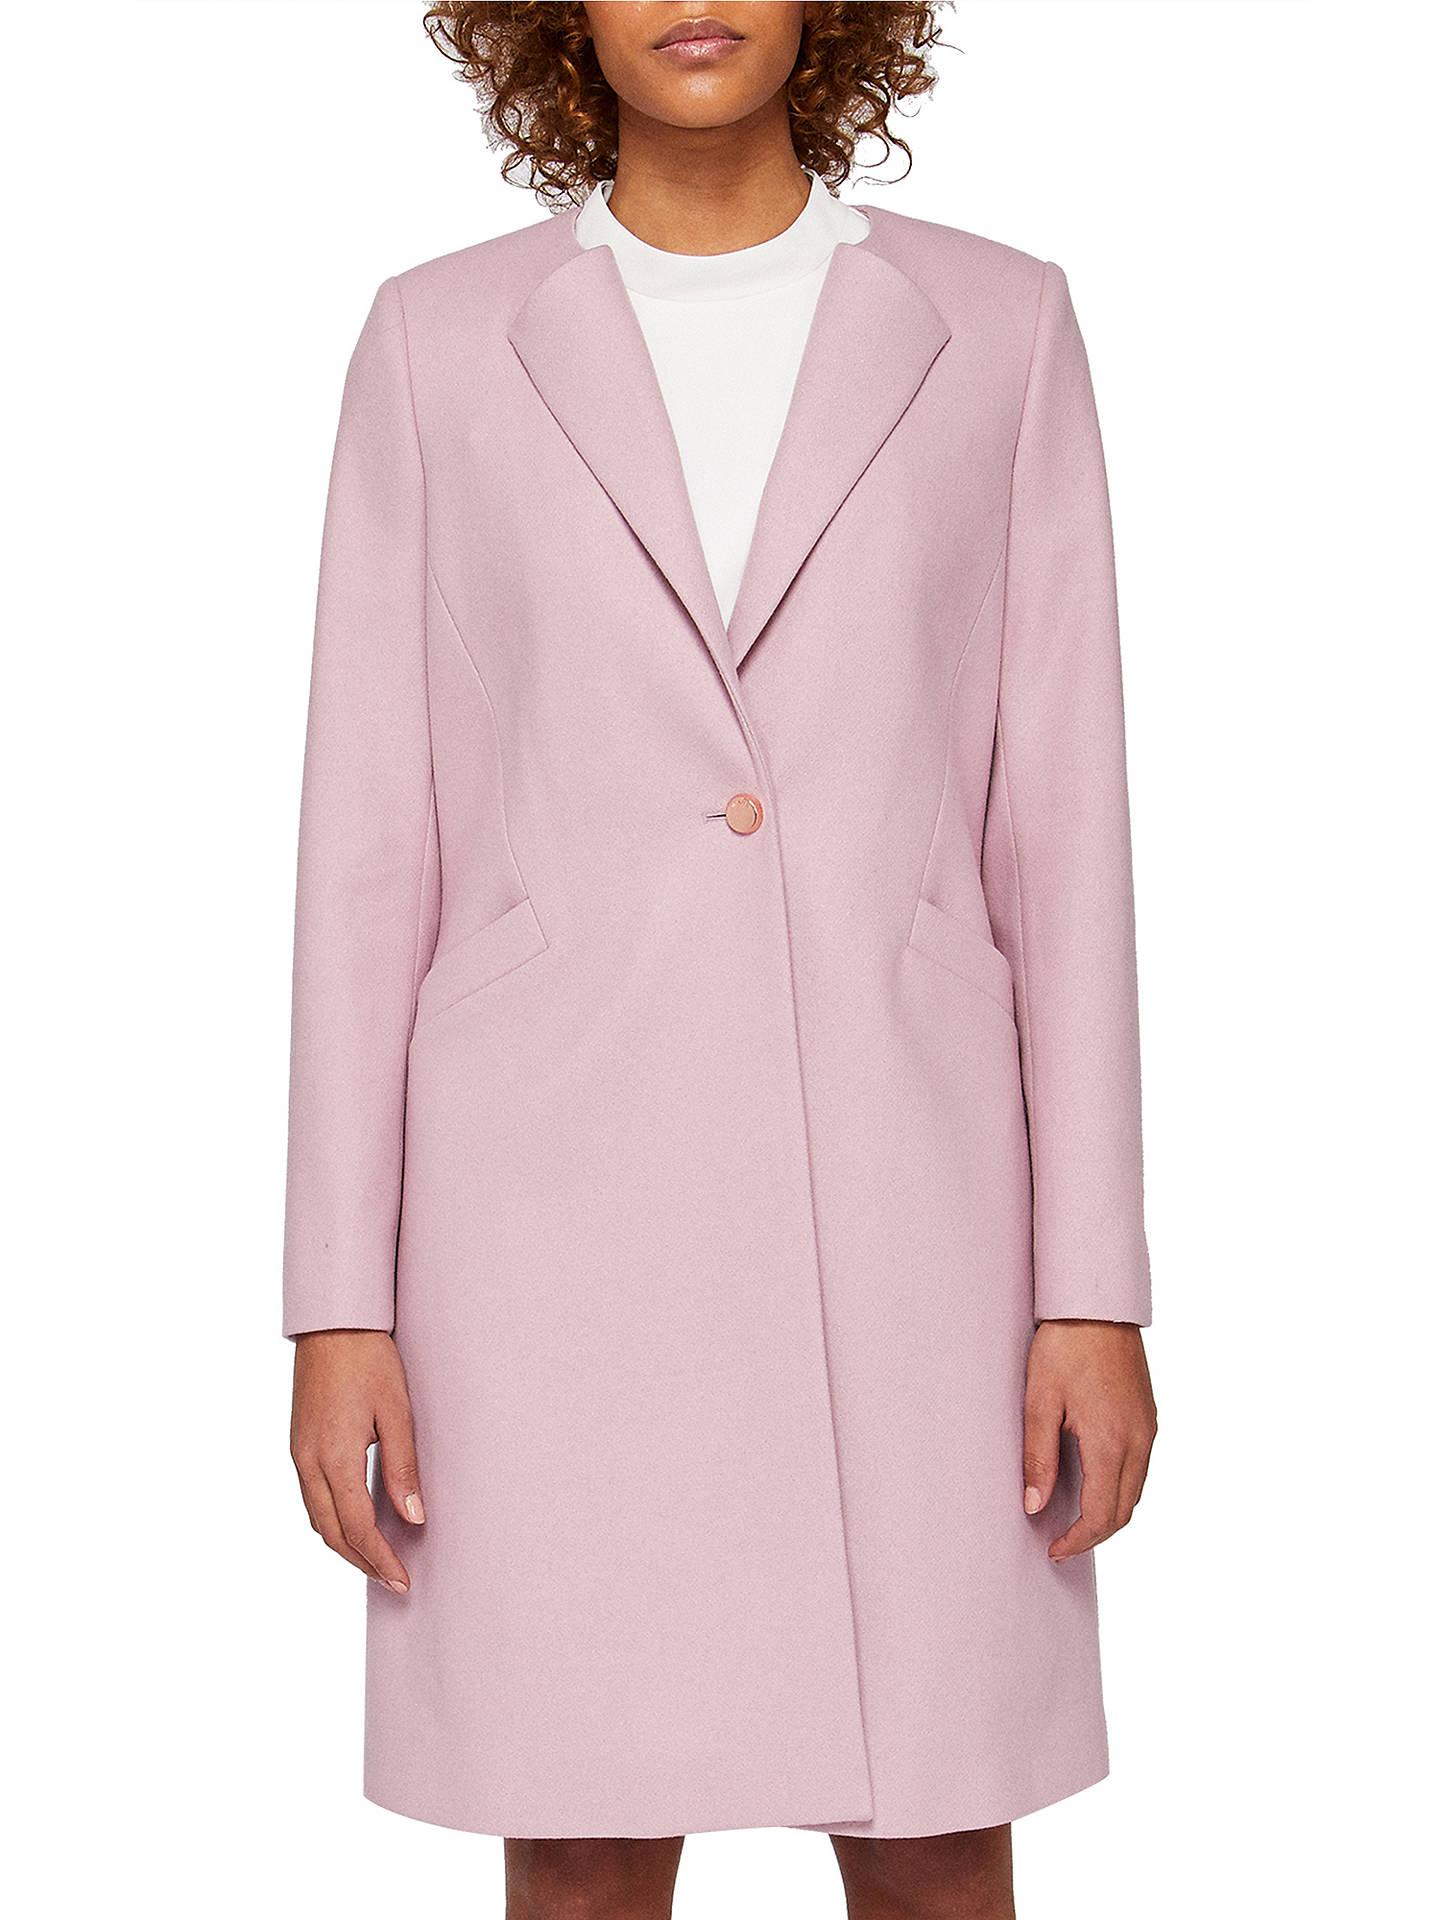 514deffd169d6 Buy Ted Baker Emilio Collarless Wool Blend Coat